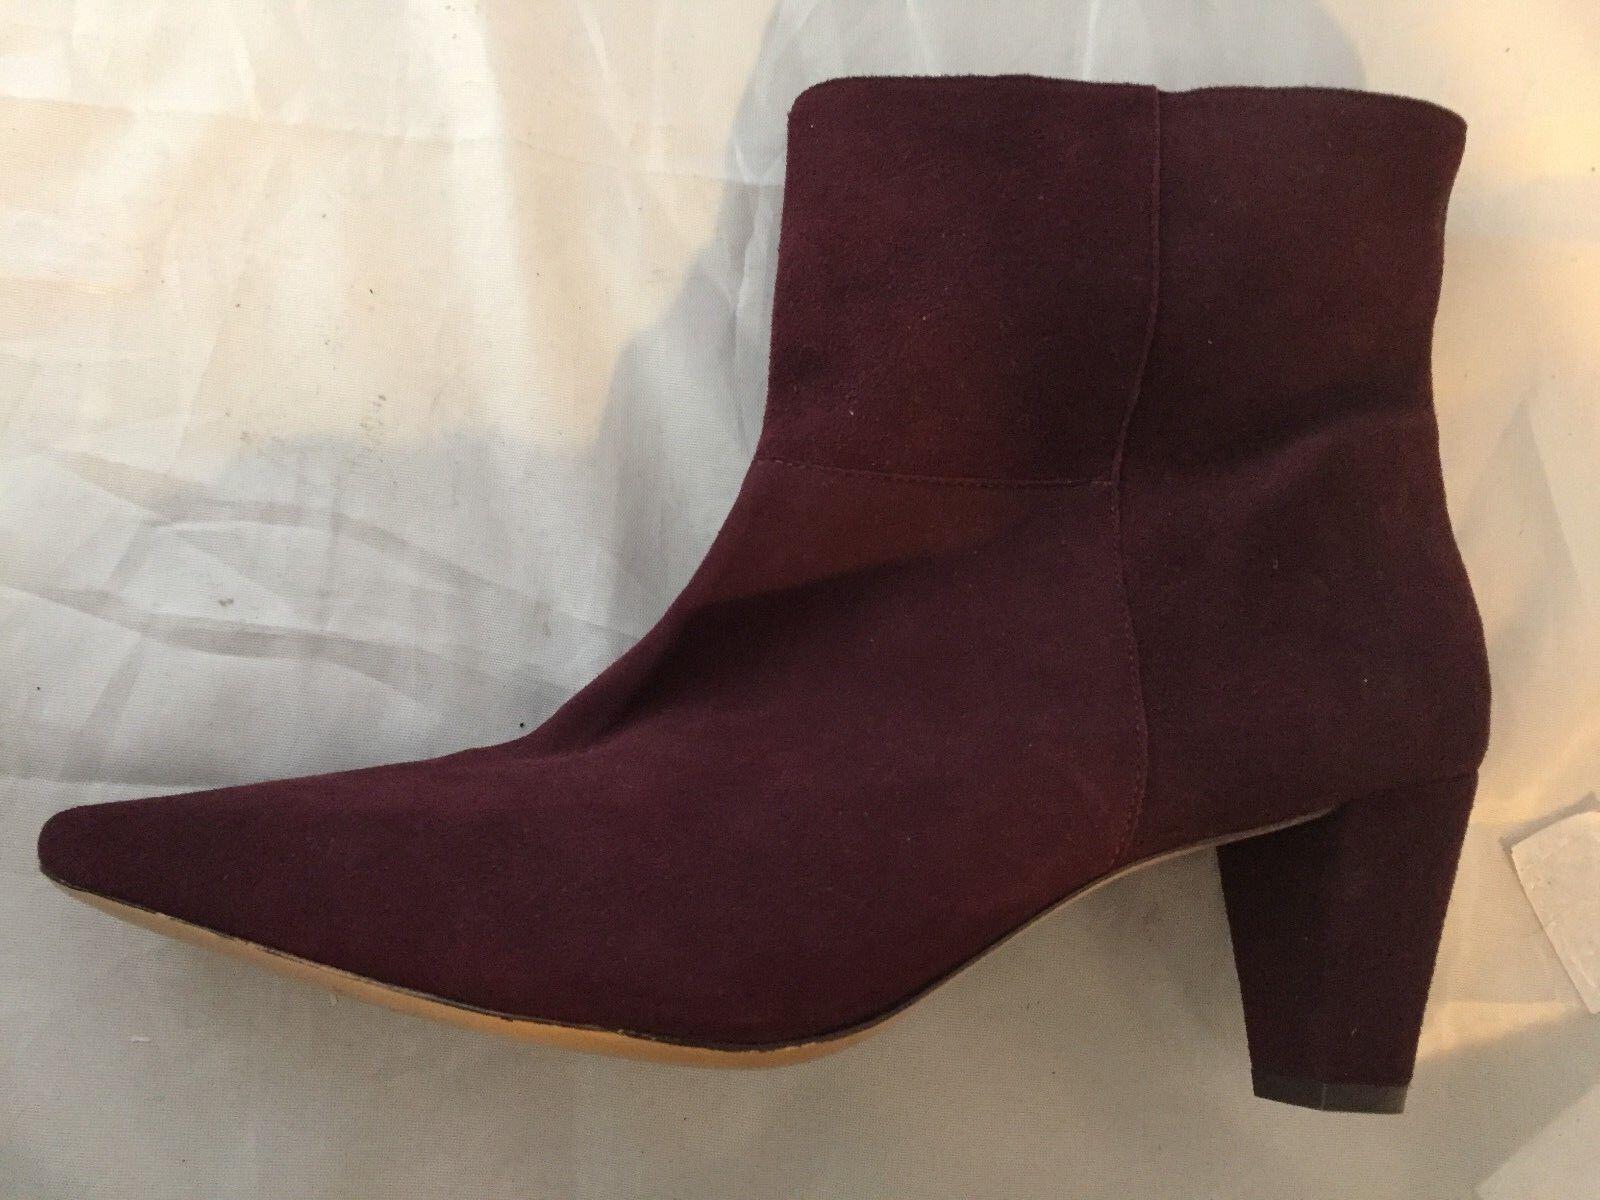 NEW Rachel Zoe Ginz Ankle Bootie, Burgundy Suede, Women Size 9.5